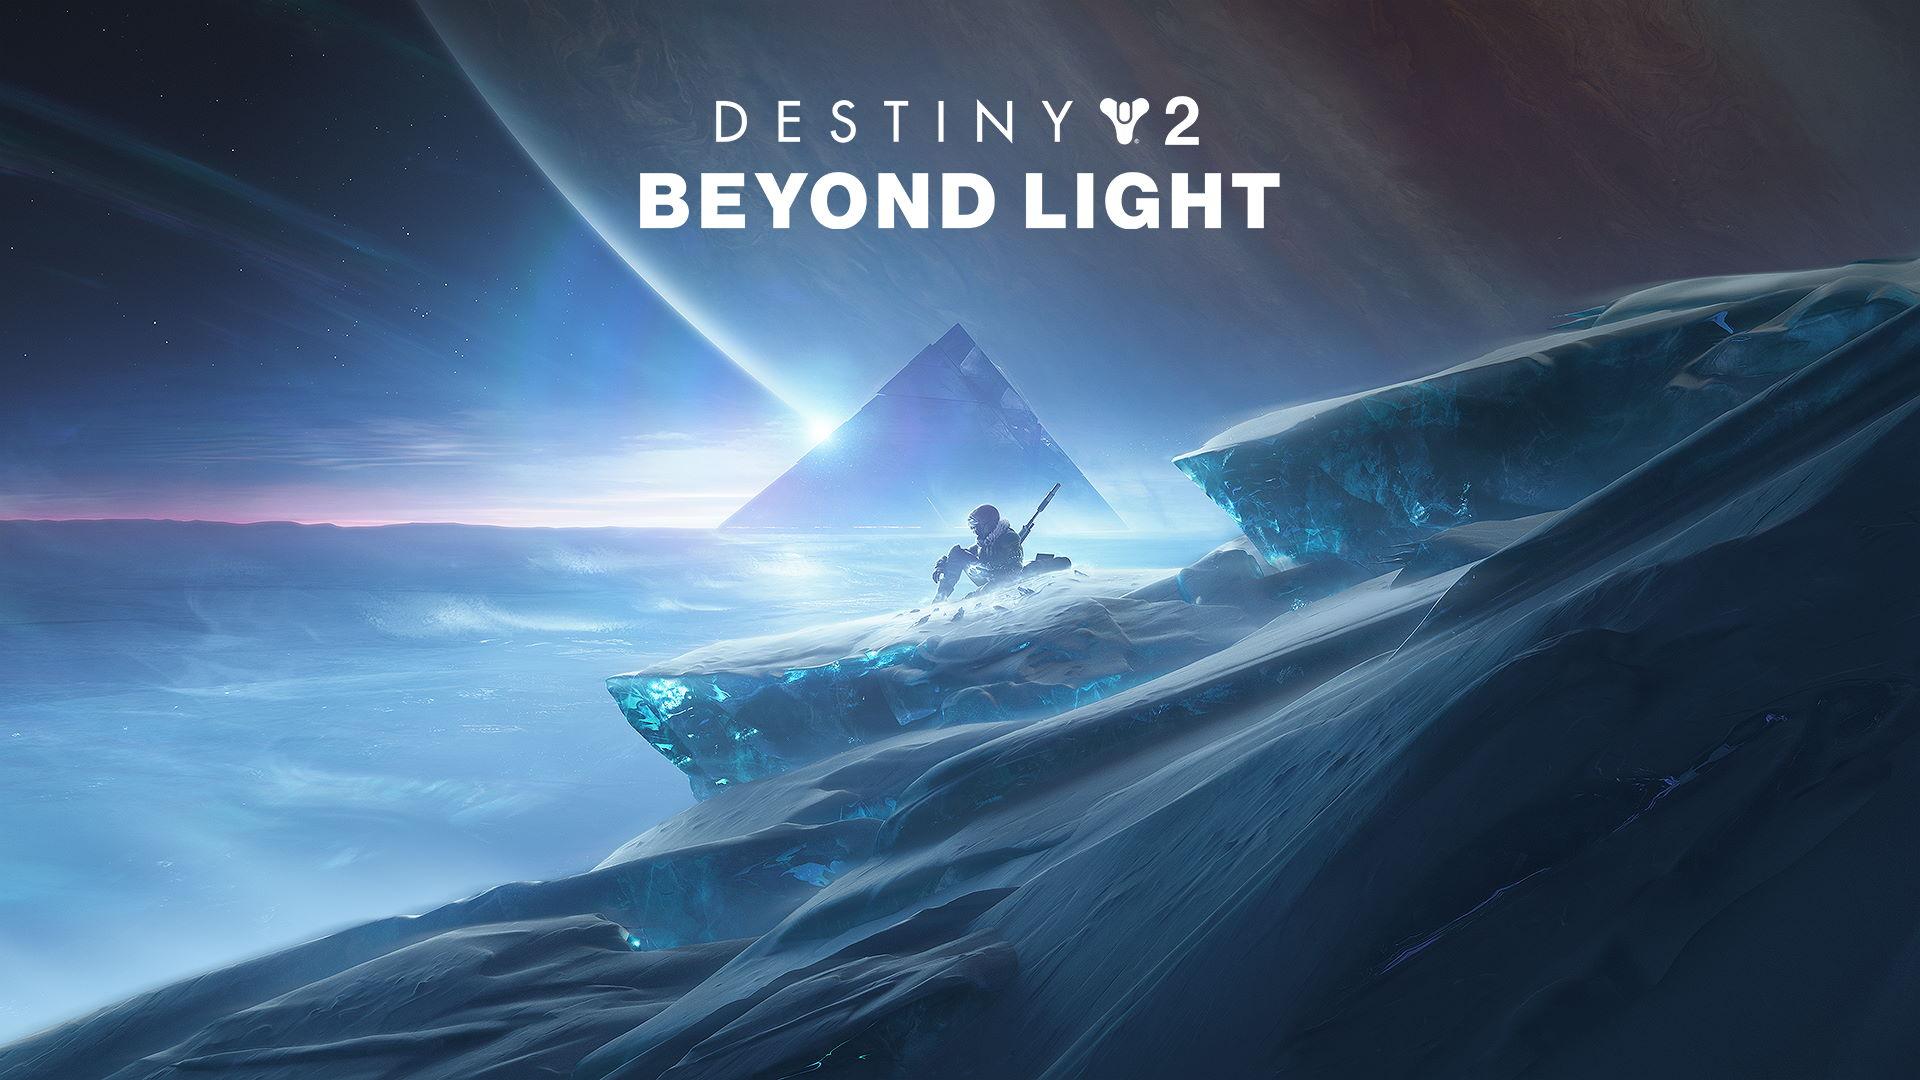 destiny-2-beyond-light-story-trailer.jpg